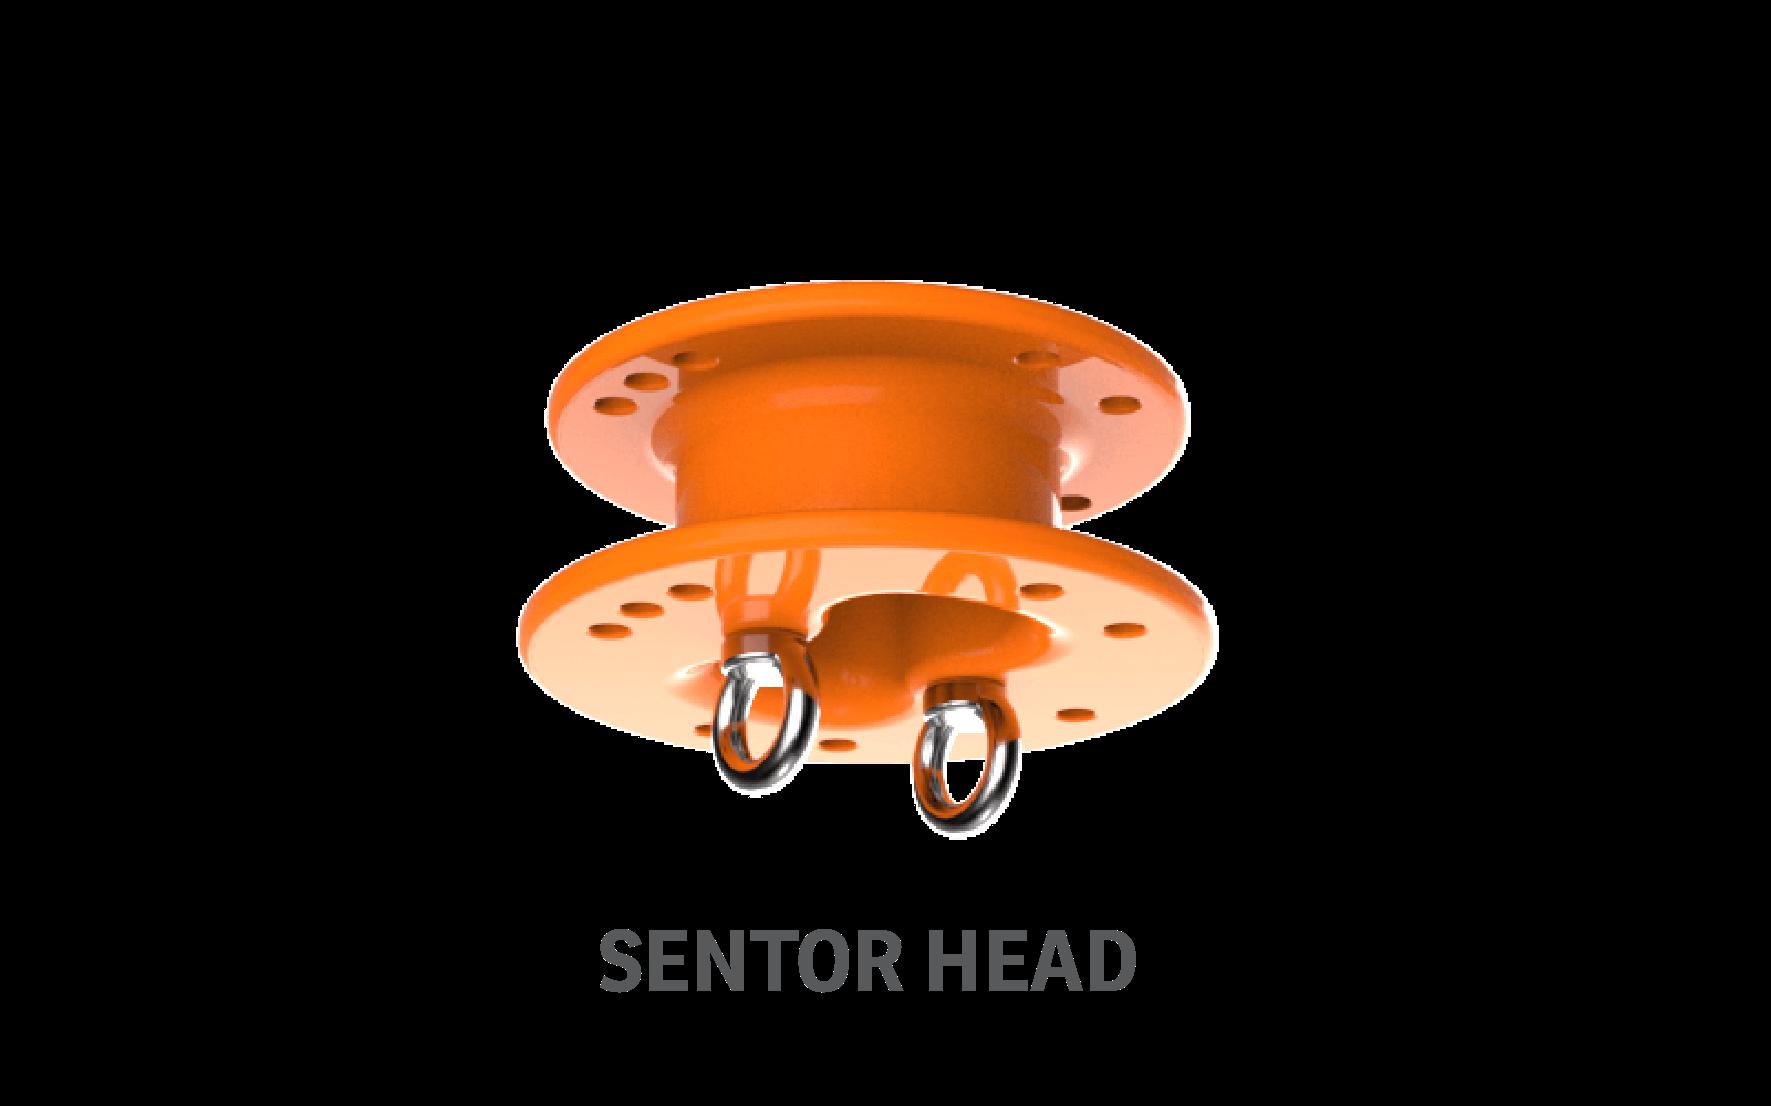 SENTOR TWINPOD